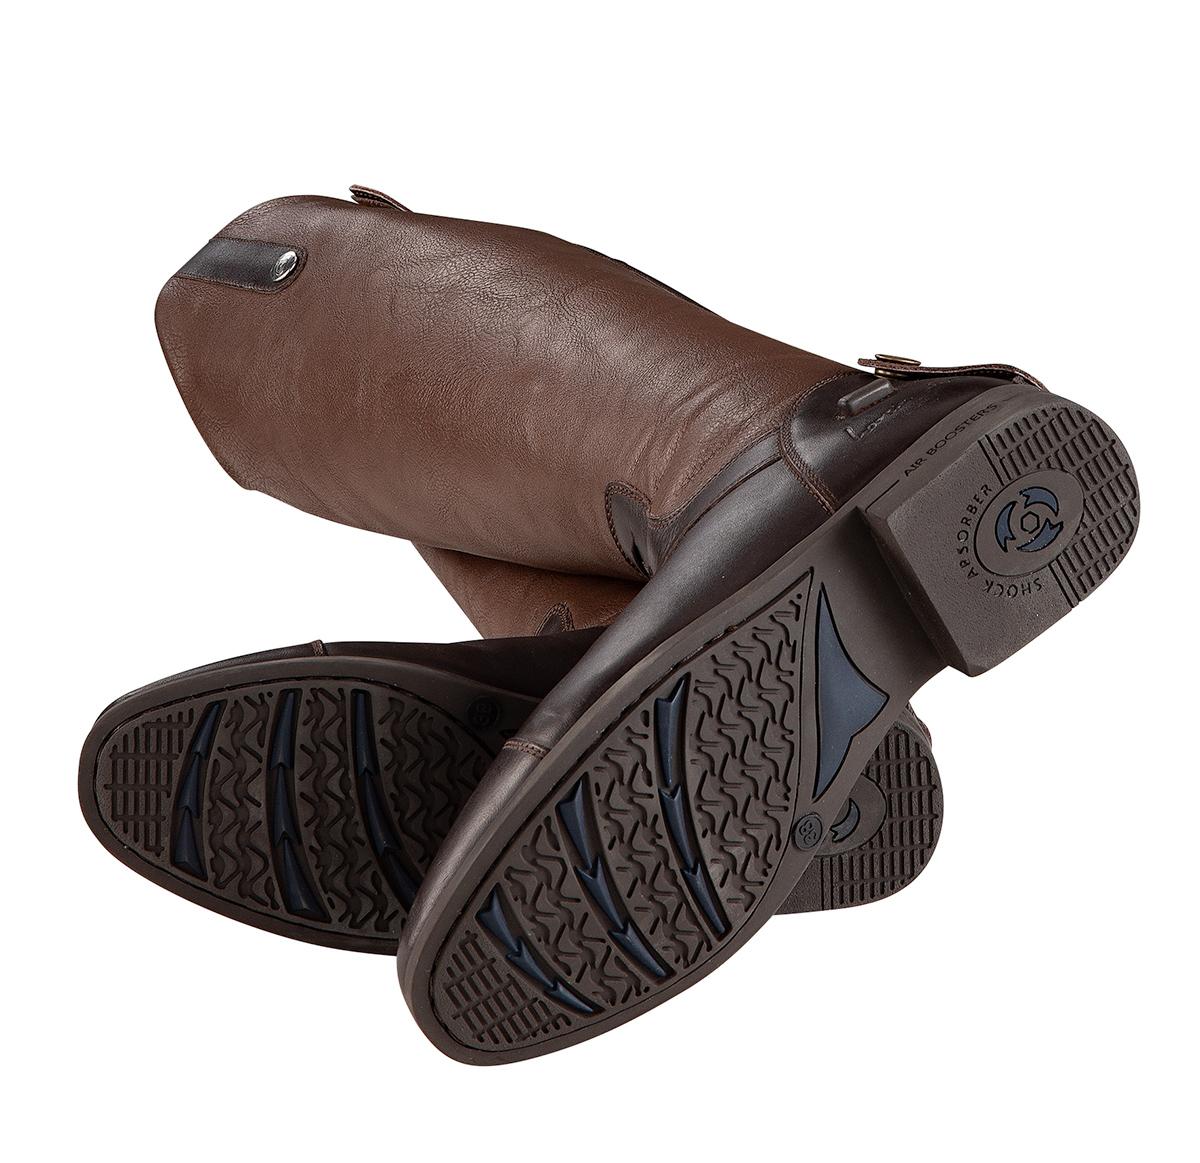 7740-7792-Field-boots-Arrox-sula